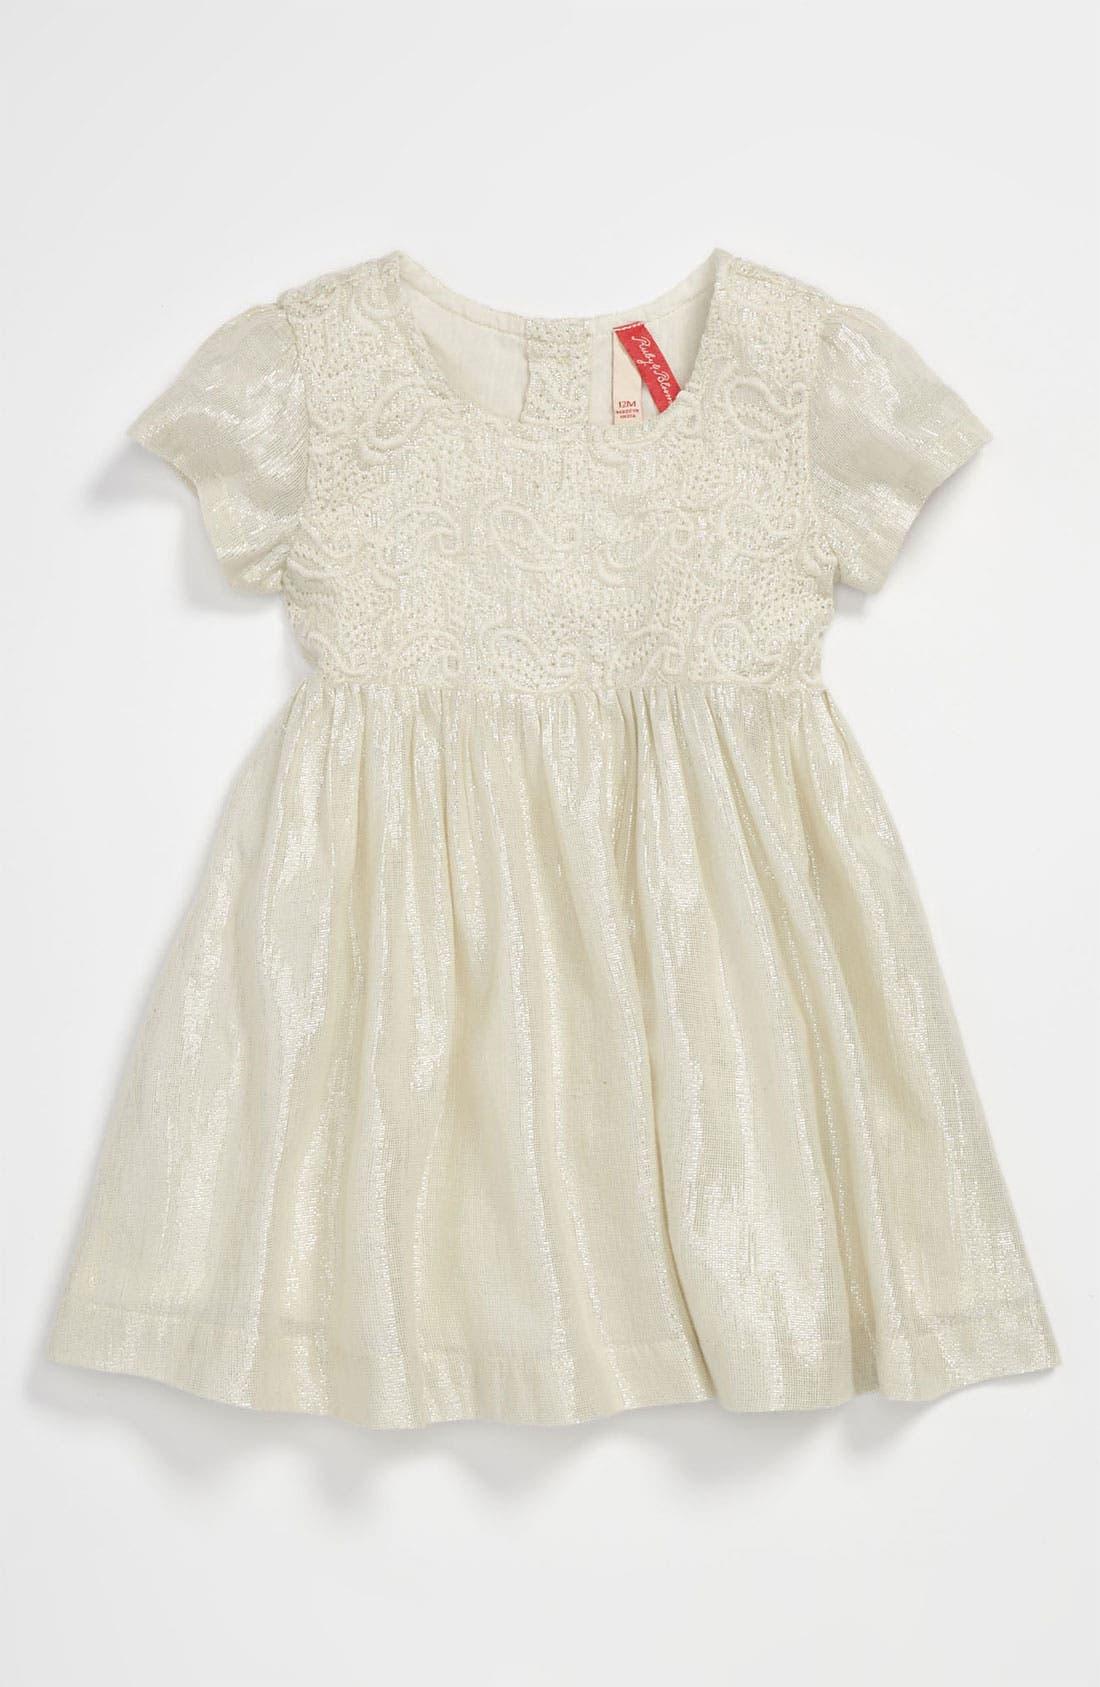 Alternate Image 1 Selected - Ruby & Bloom 'Giselle' Dress (Infant)